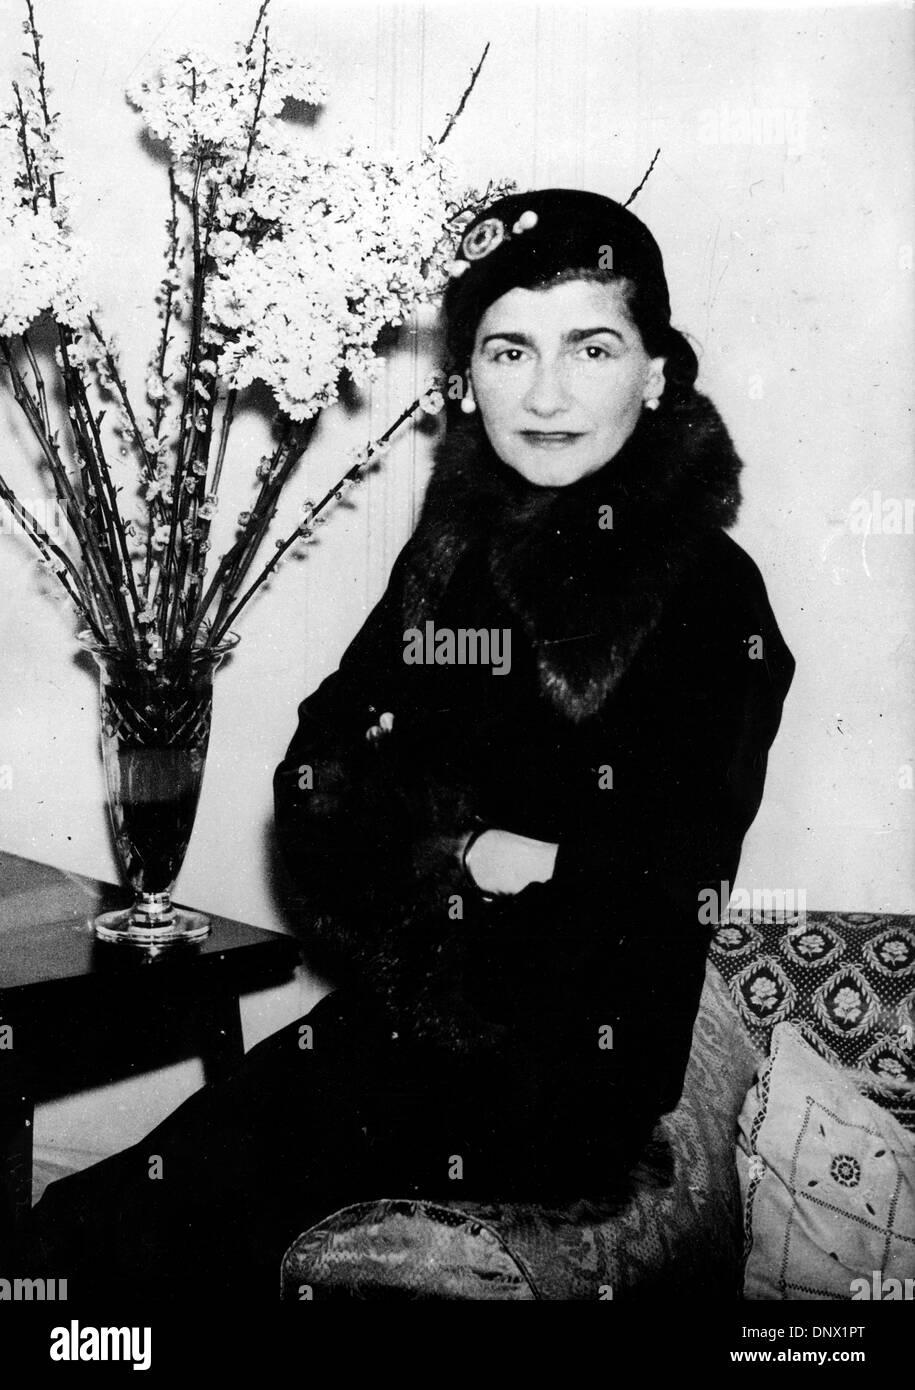 0479aa993d3e76 23, 1932 - London, England, U.K. - COCO CHANEL (born Gabrielle Bonheur  Chanel) was a pioneering French fashion designer whose modernist  philosophy, ...